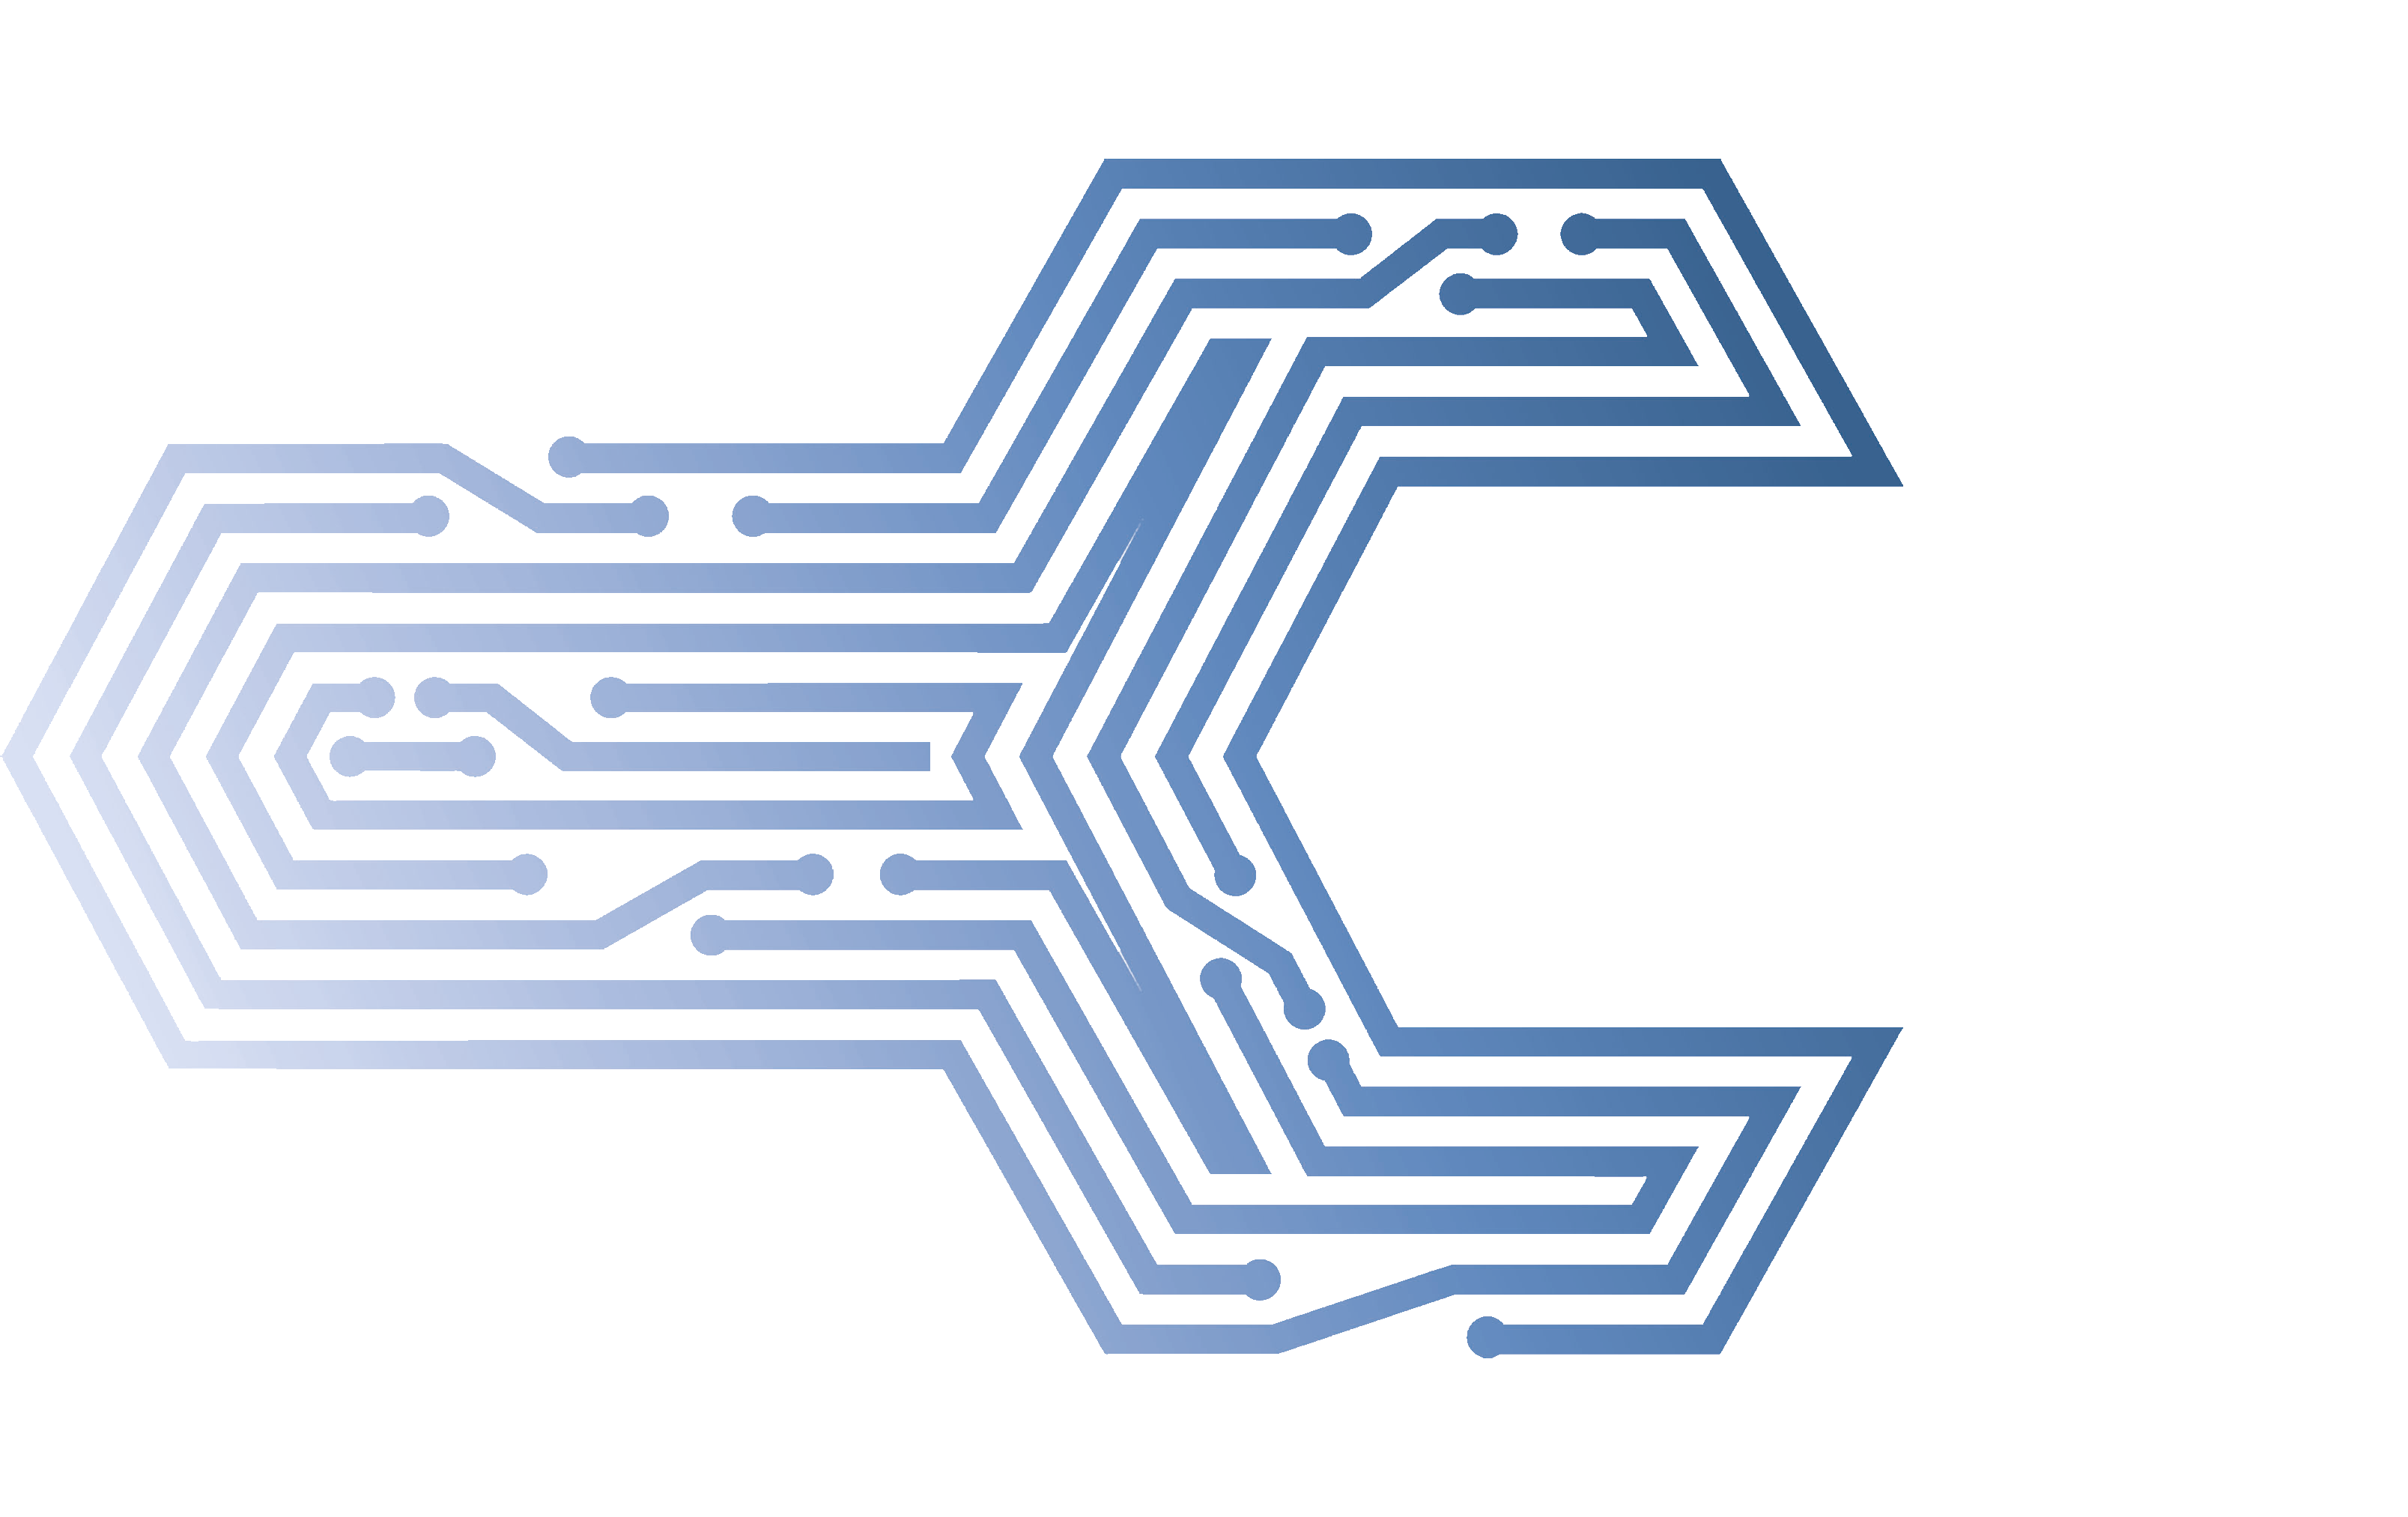 Digital Forum der Industrie. Powered by FoxBase.